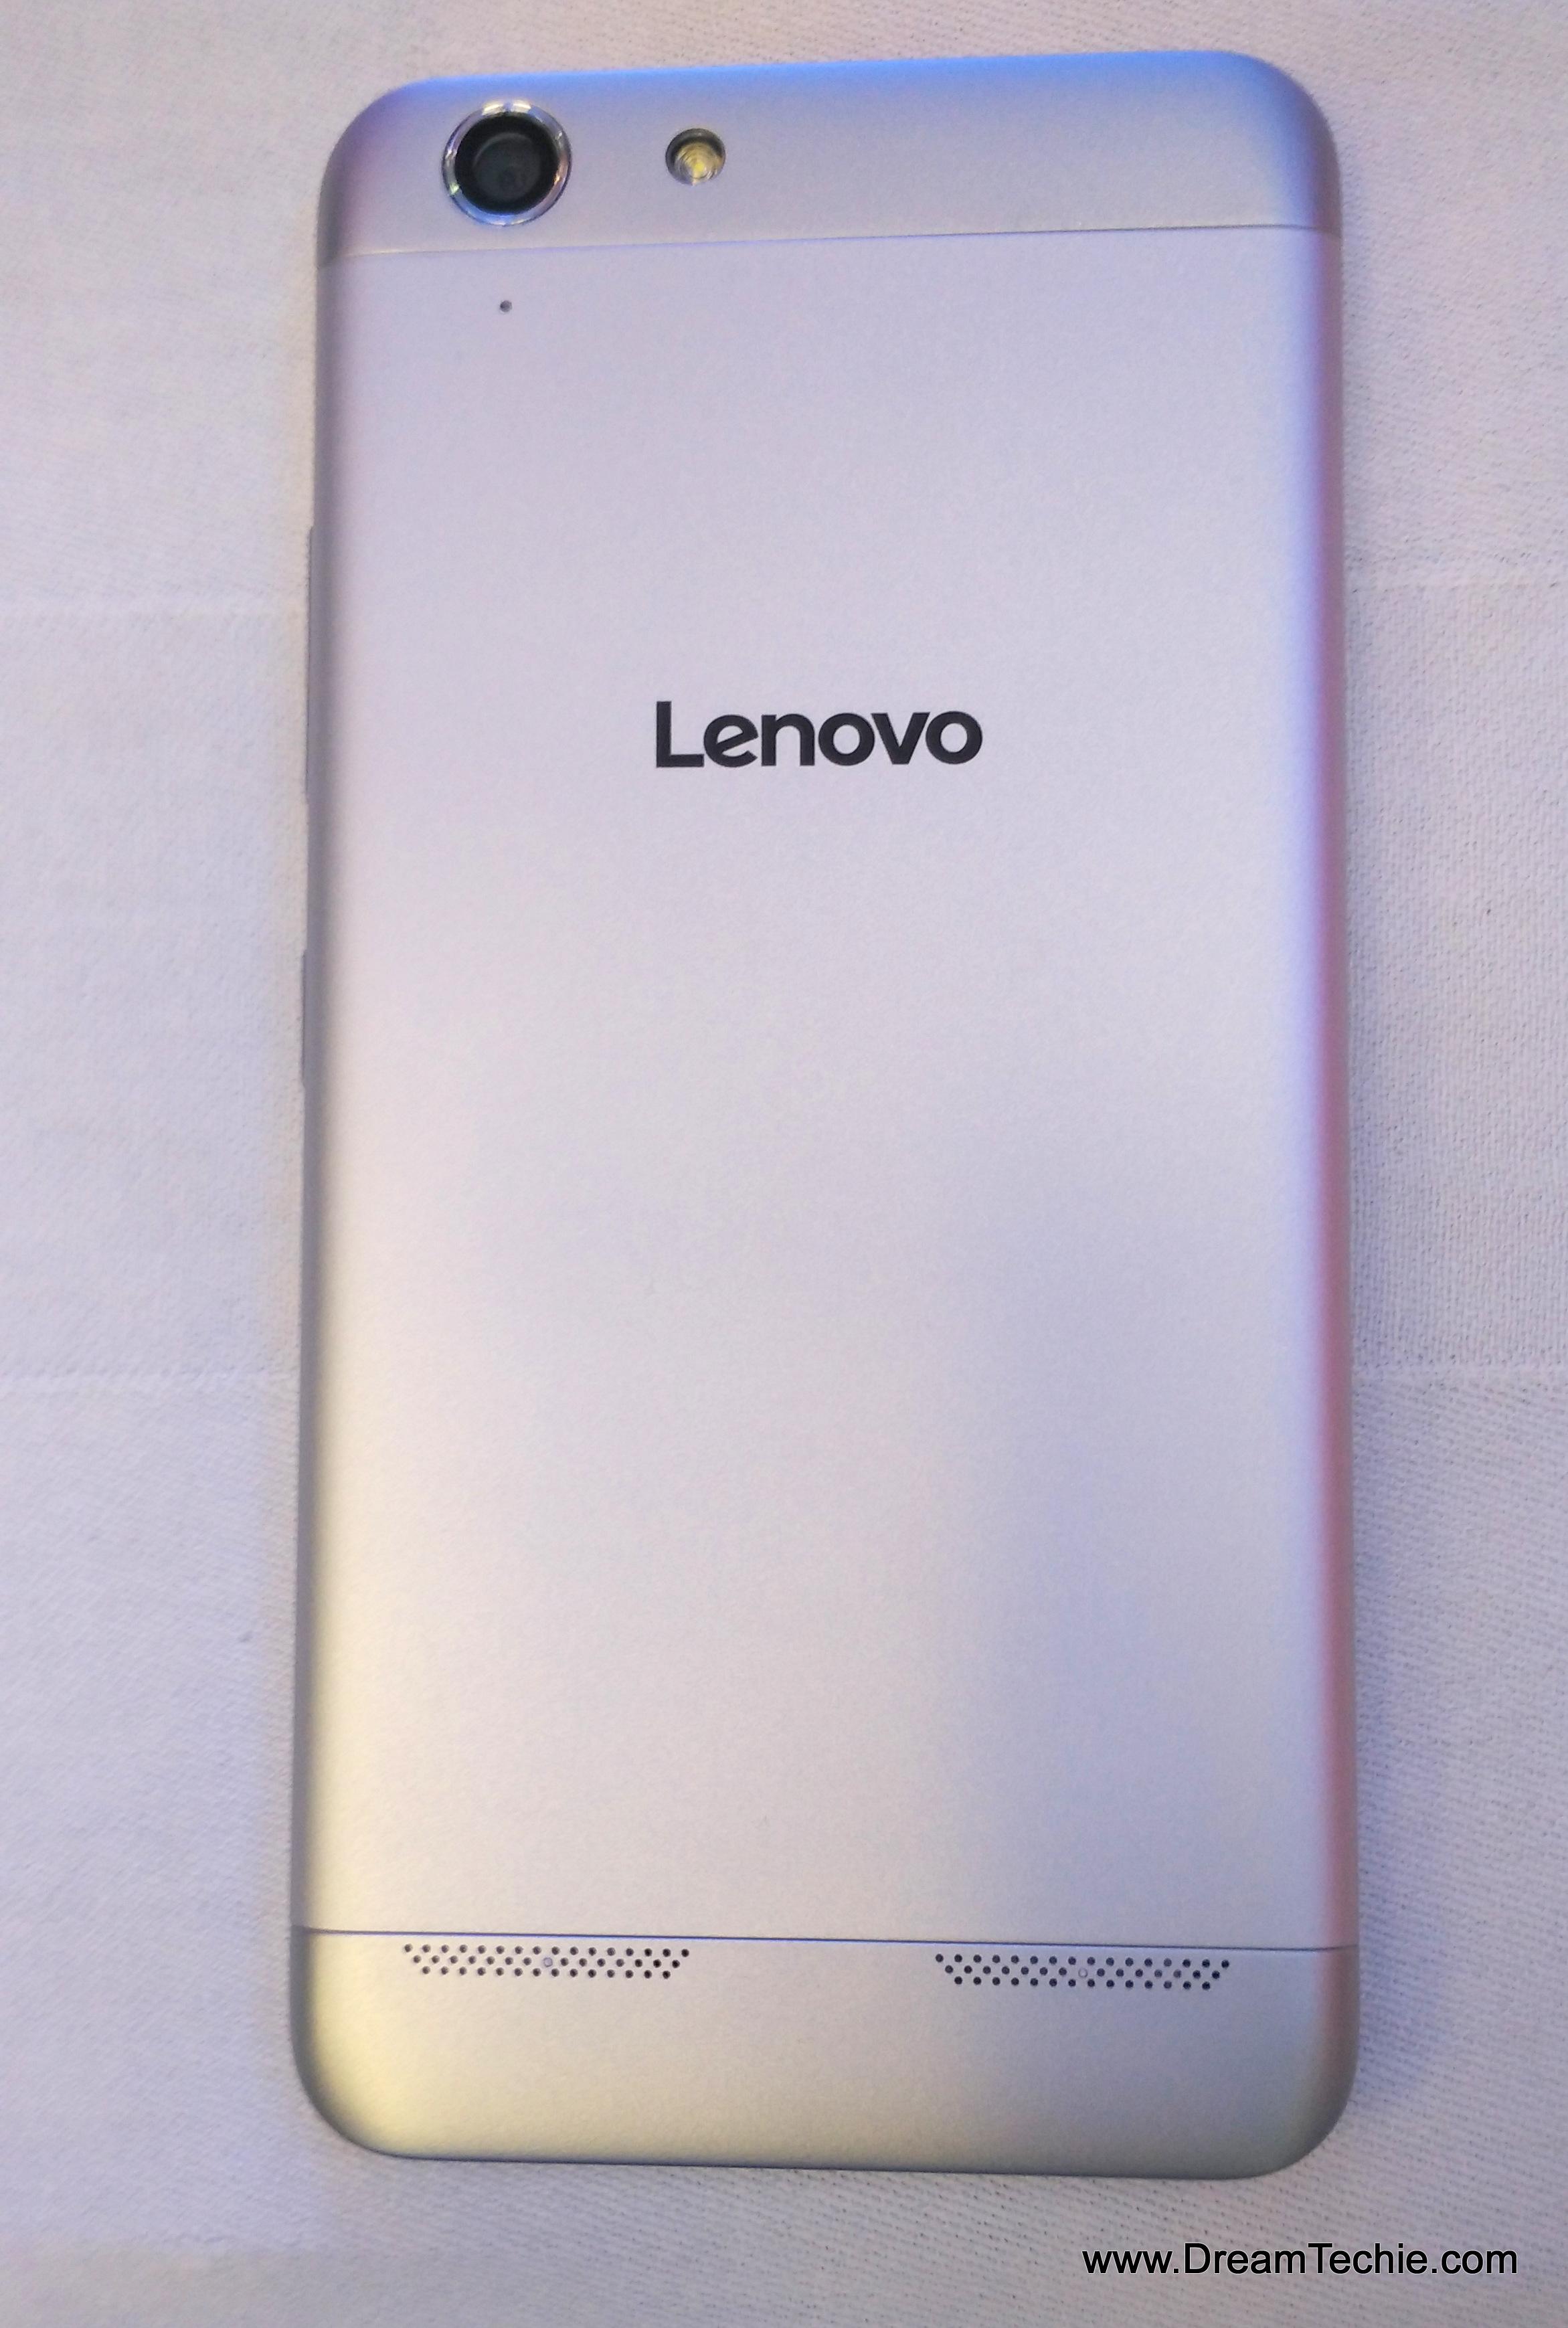 Lenovo Vibe K5 Plus Silver Color Pics